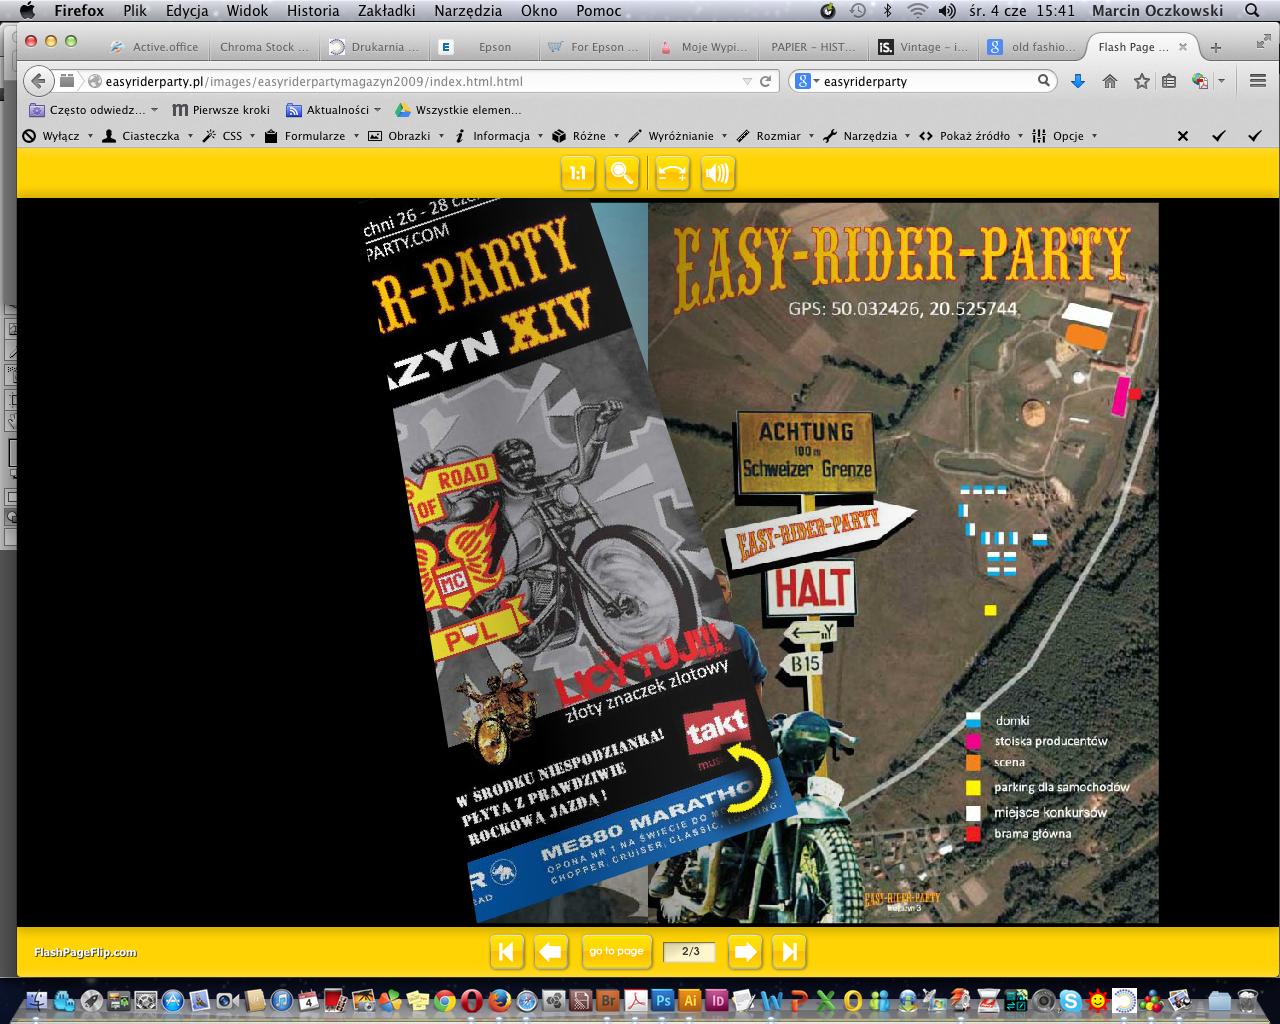 Zrzut ekranu 2014-06-4 o 15.41.42